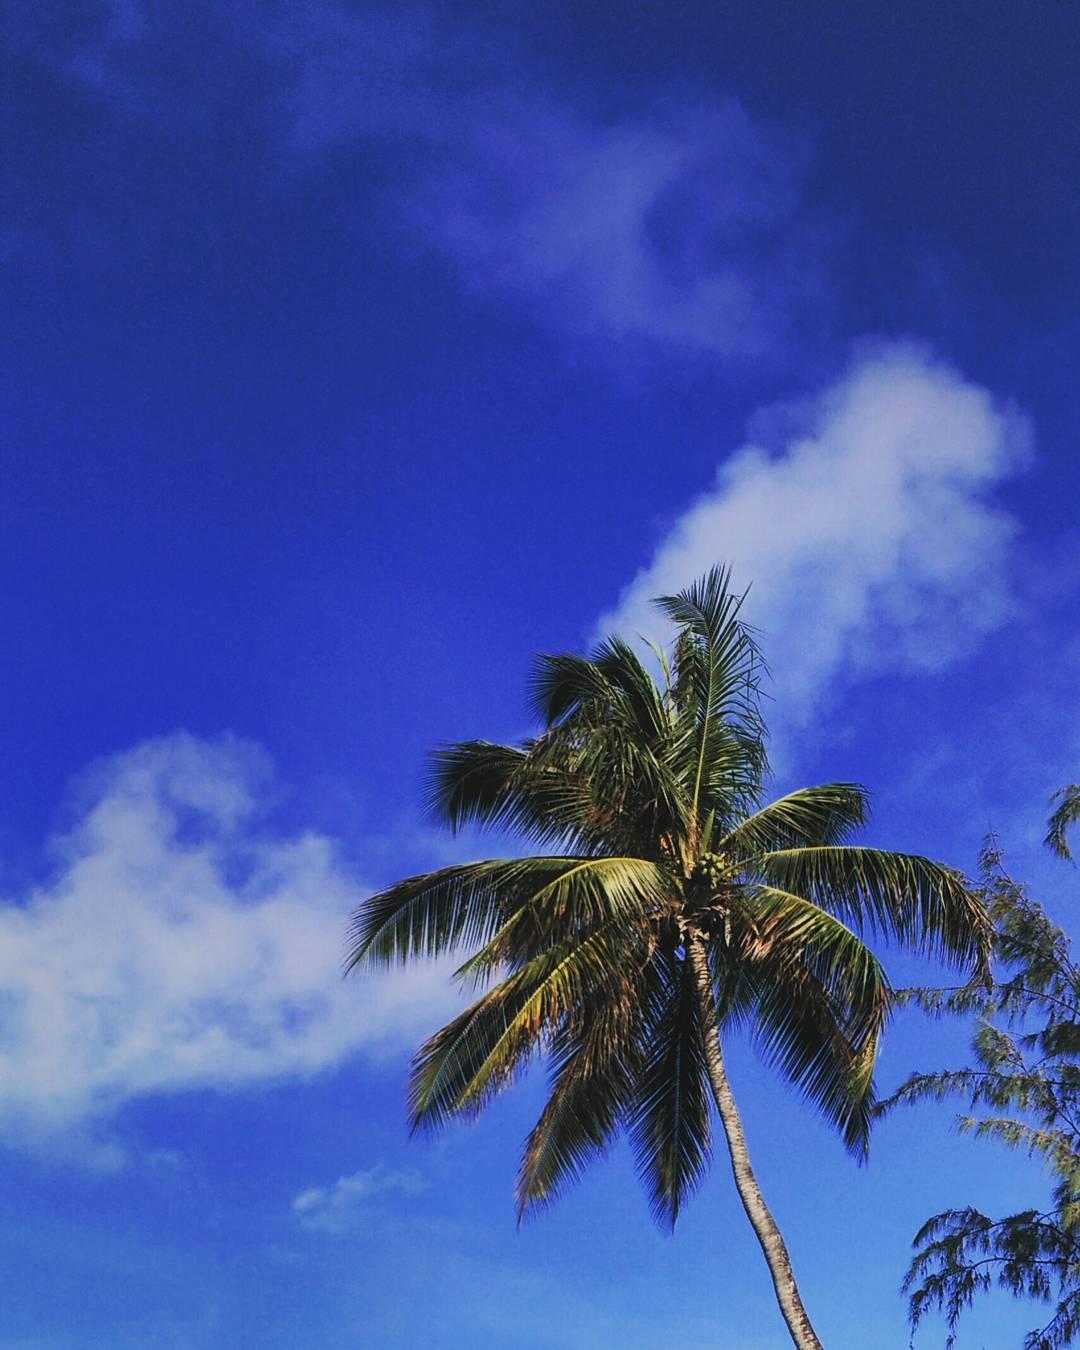 #AkelaSurf Office #morningview #barbados #tropical #paradise